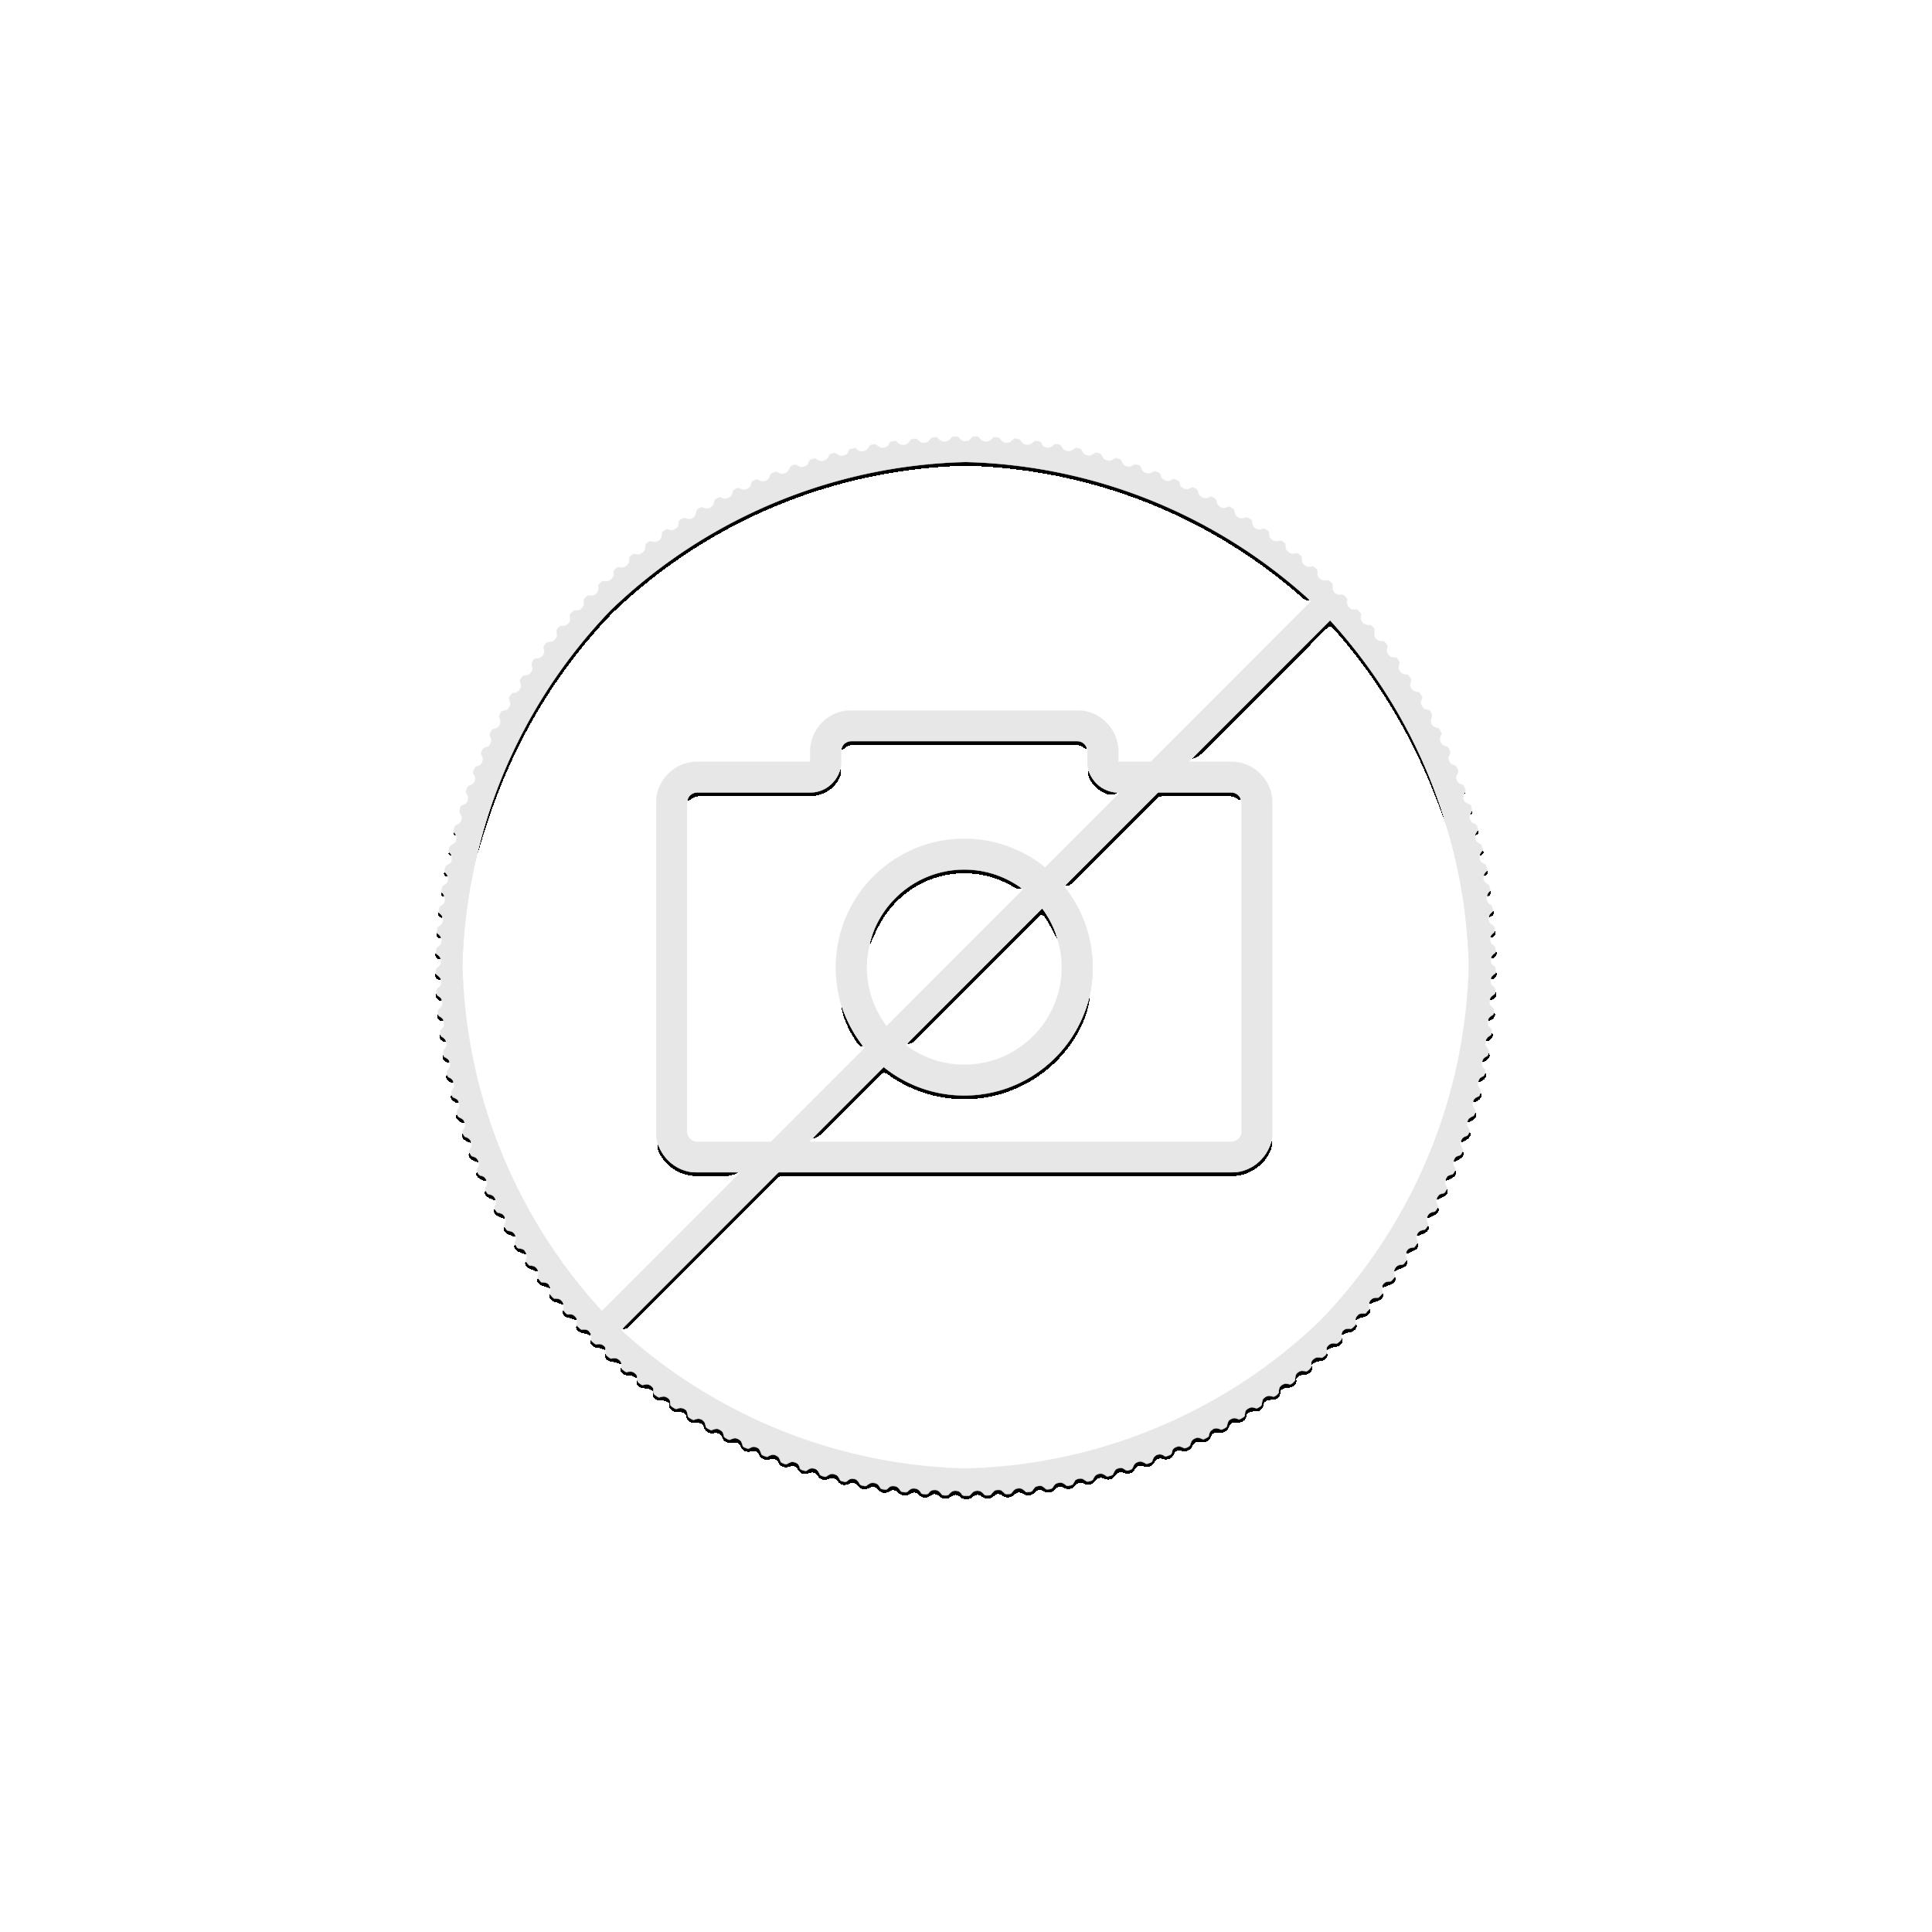 1/2 troy ounce Gouden Panda munt  van 2011